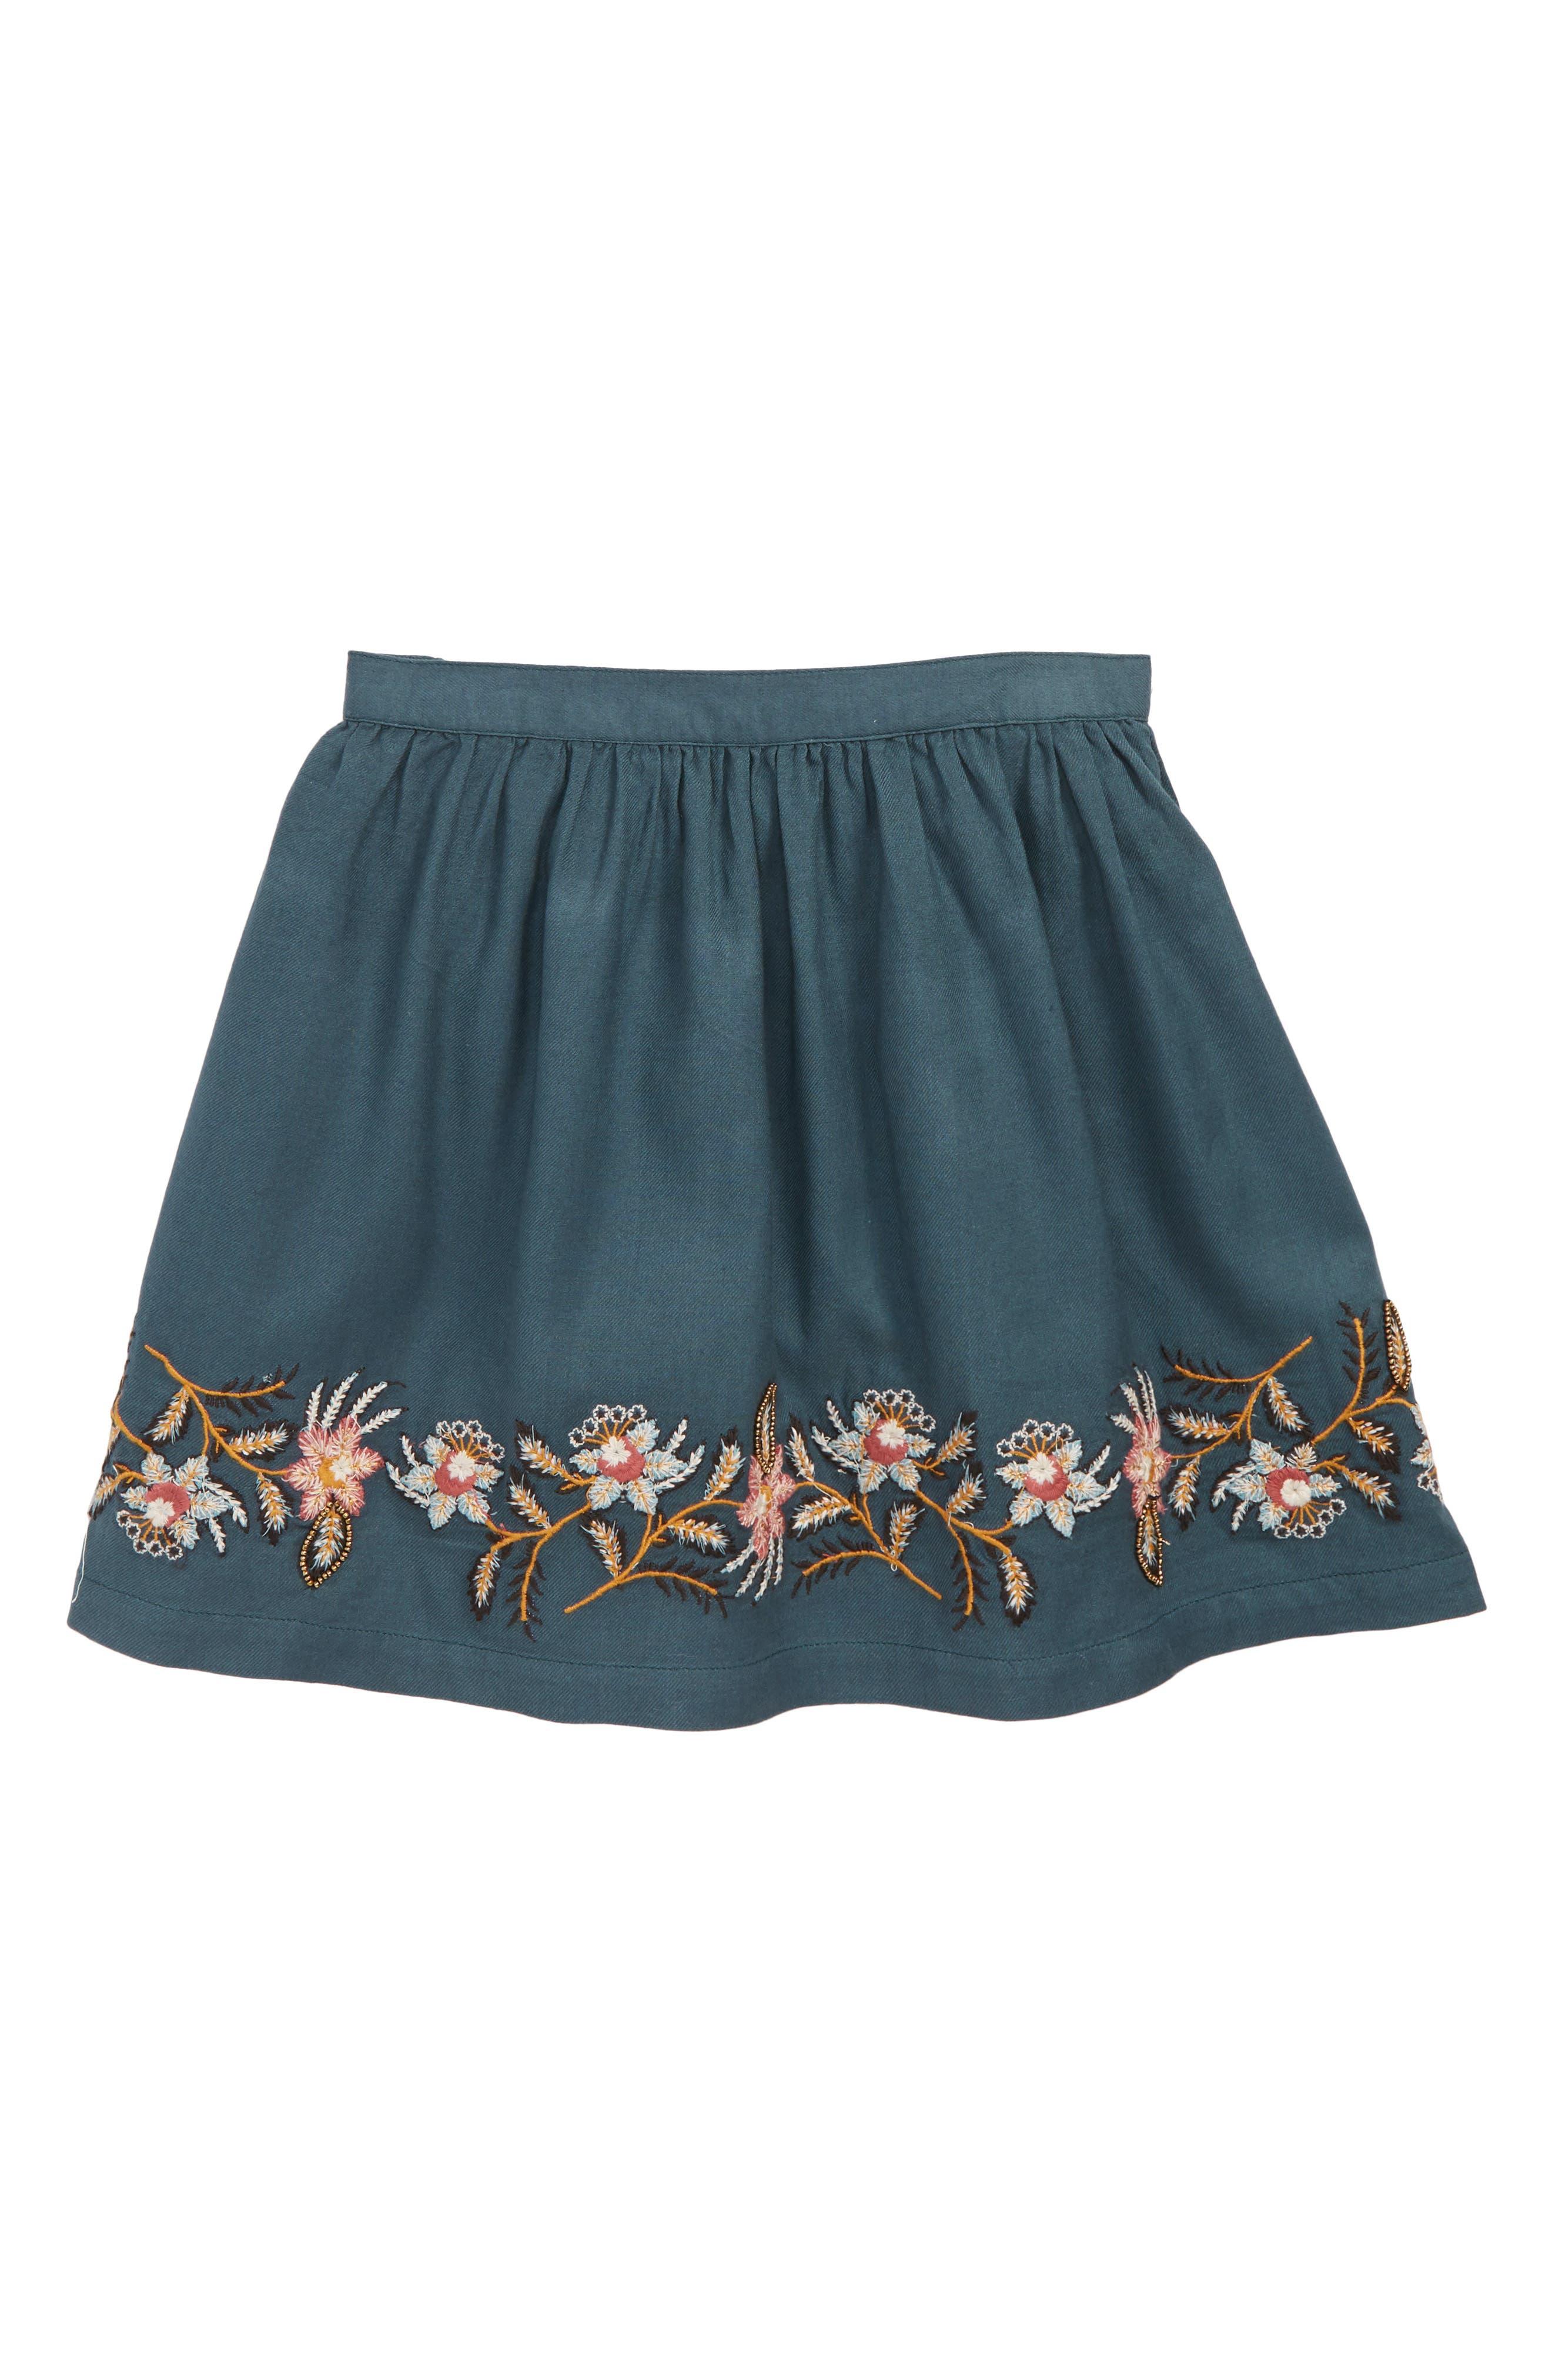 Toddler Girls Peek Embroidered Skirt Size 3T  Green